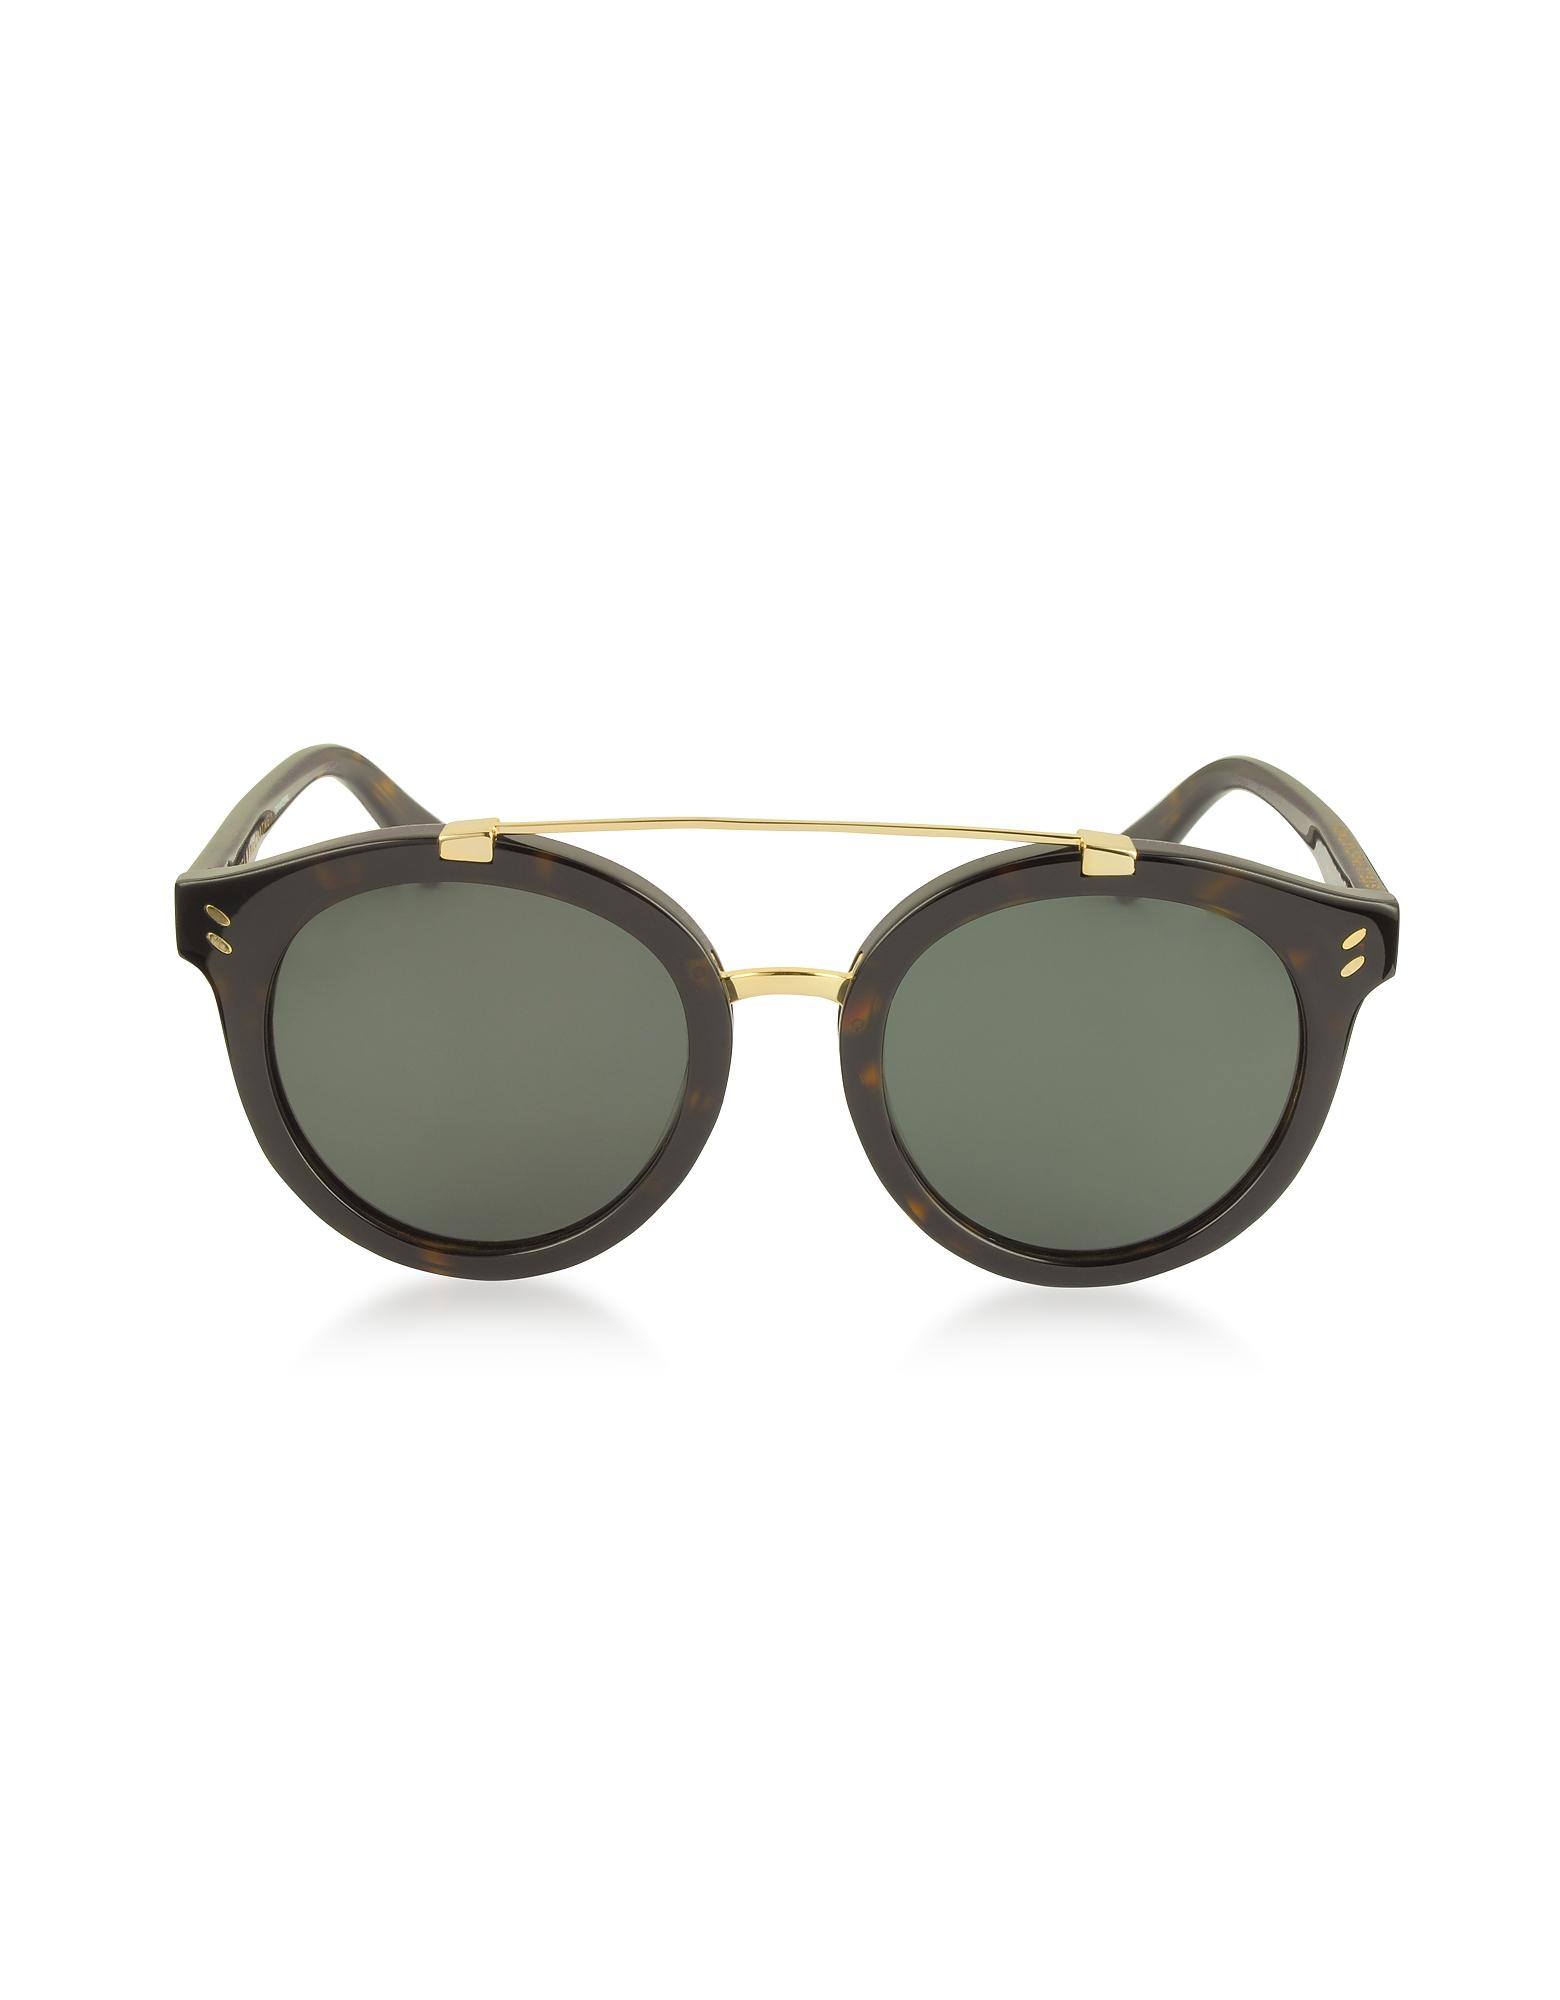 Stella McCartney Sunglasses, SC0054S Round Aviator Acetate Women's Sunglasses